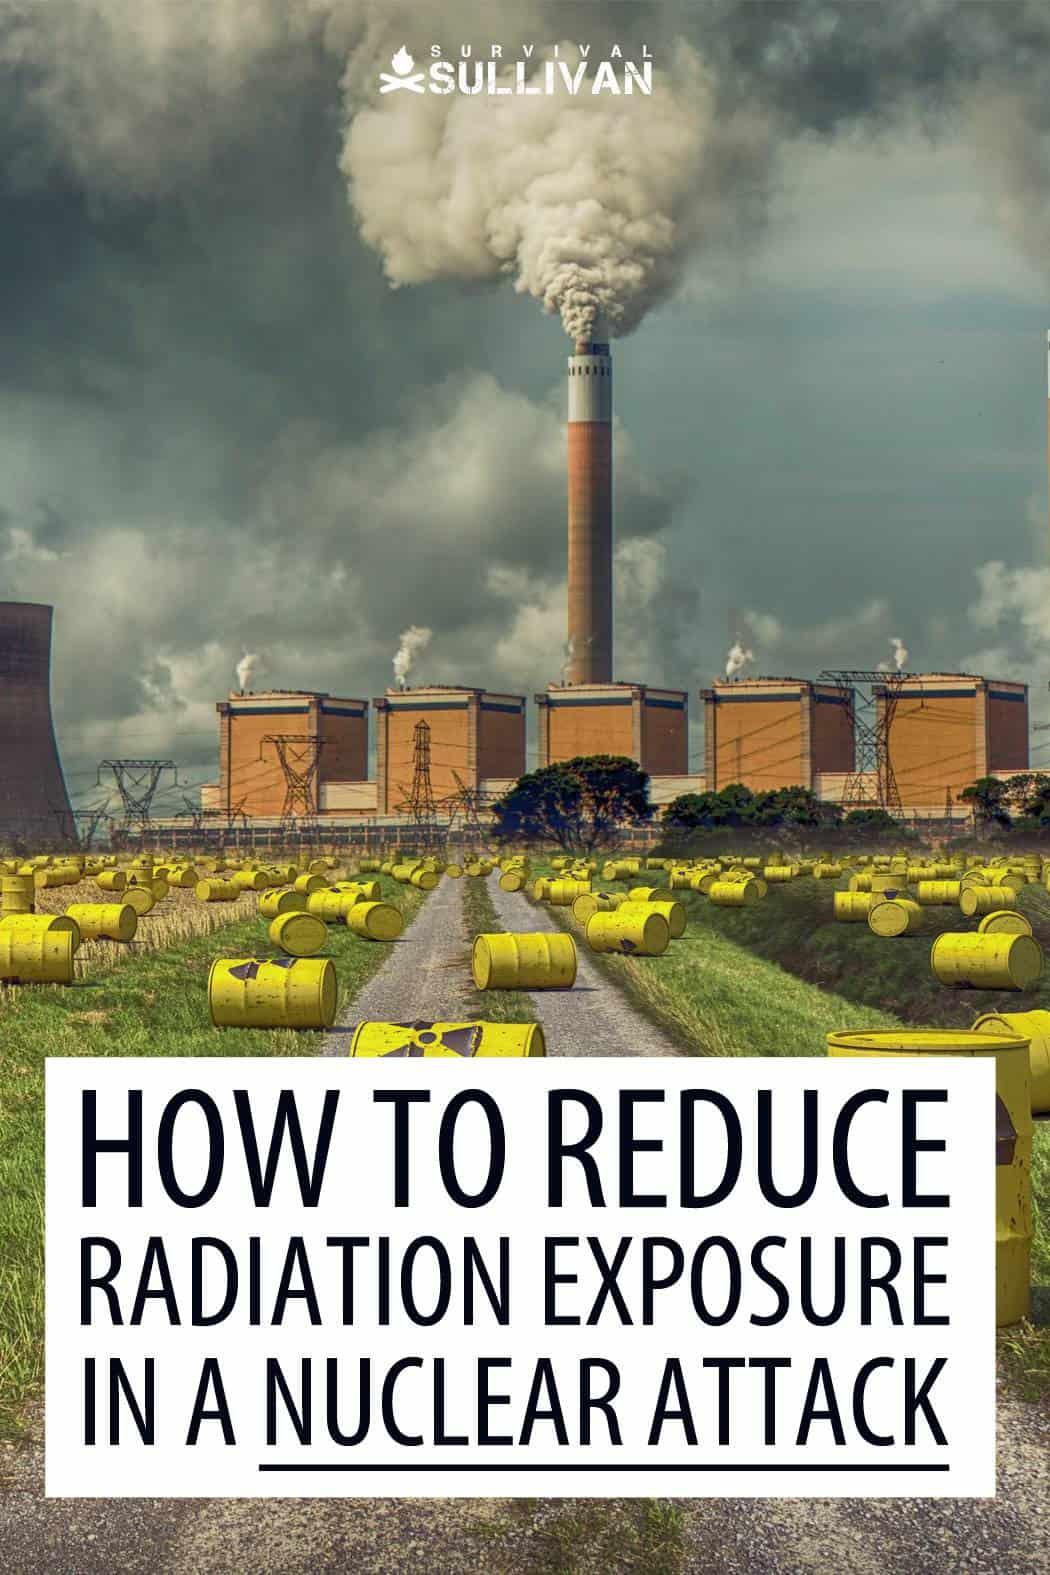 reduce radiation exposure pin image